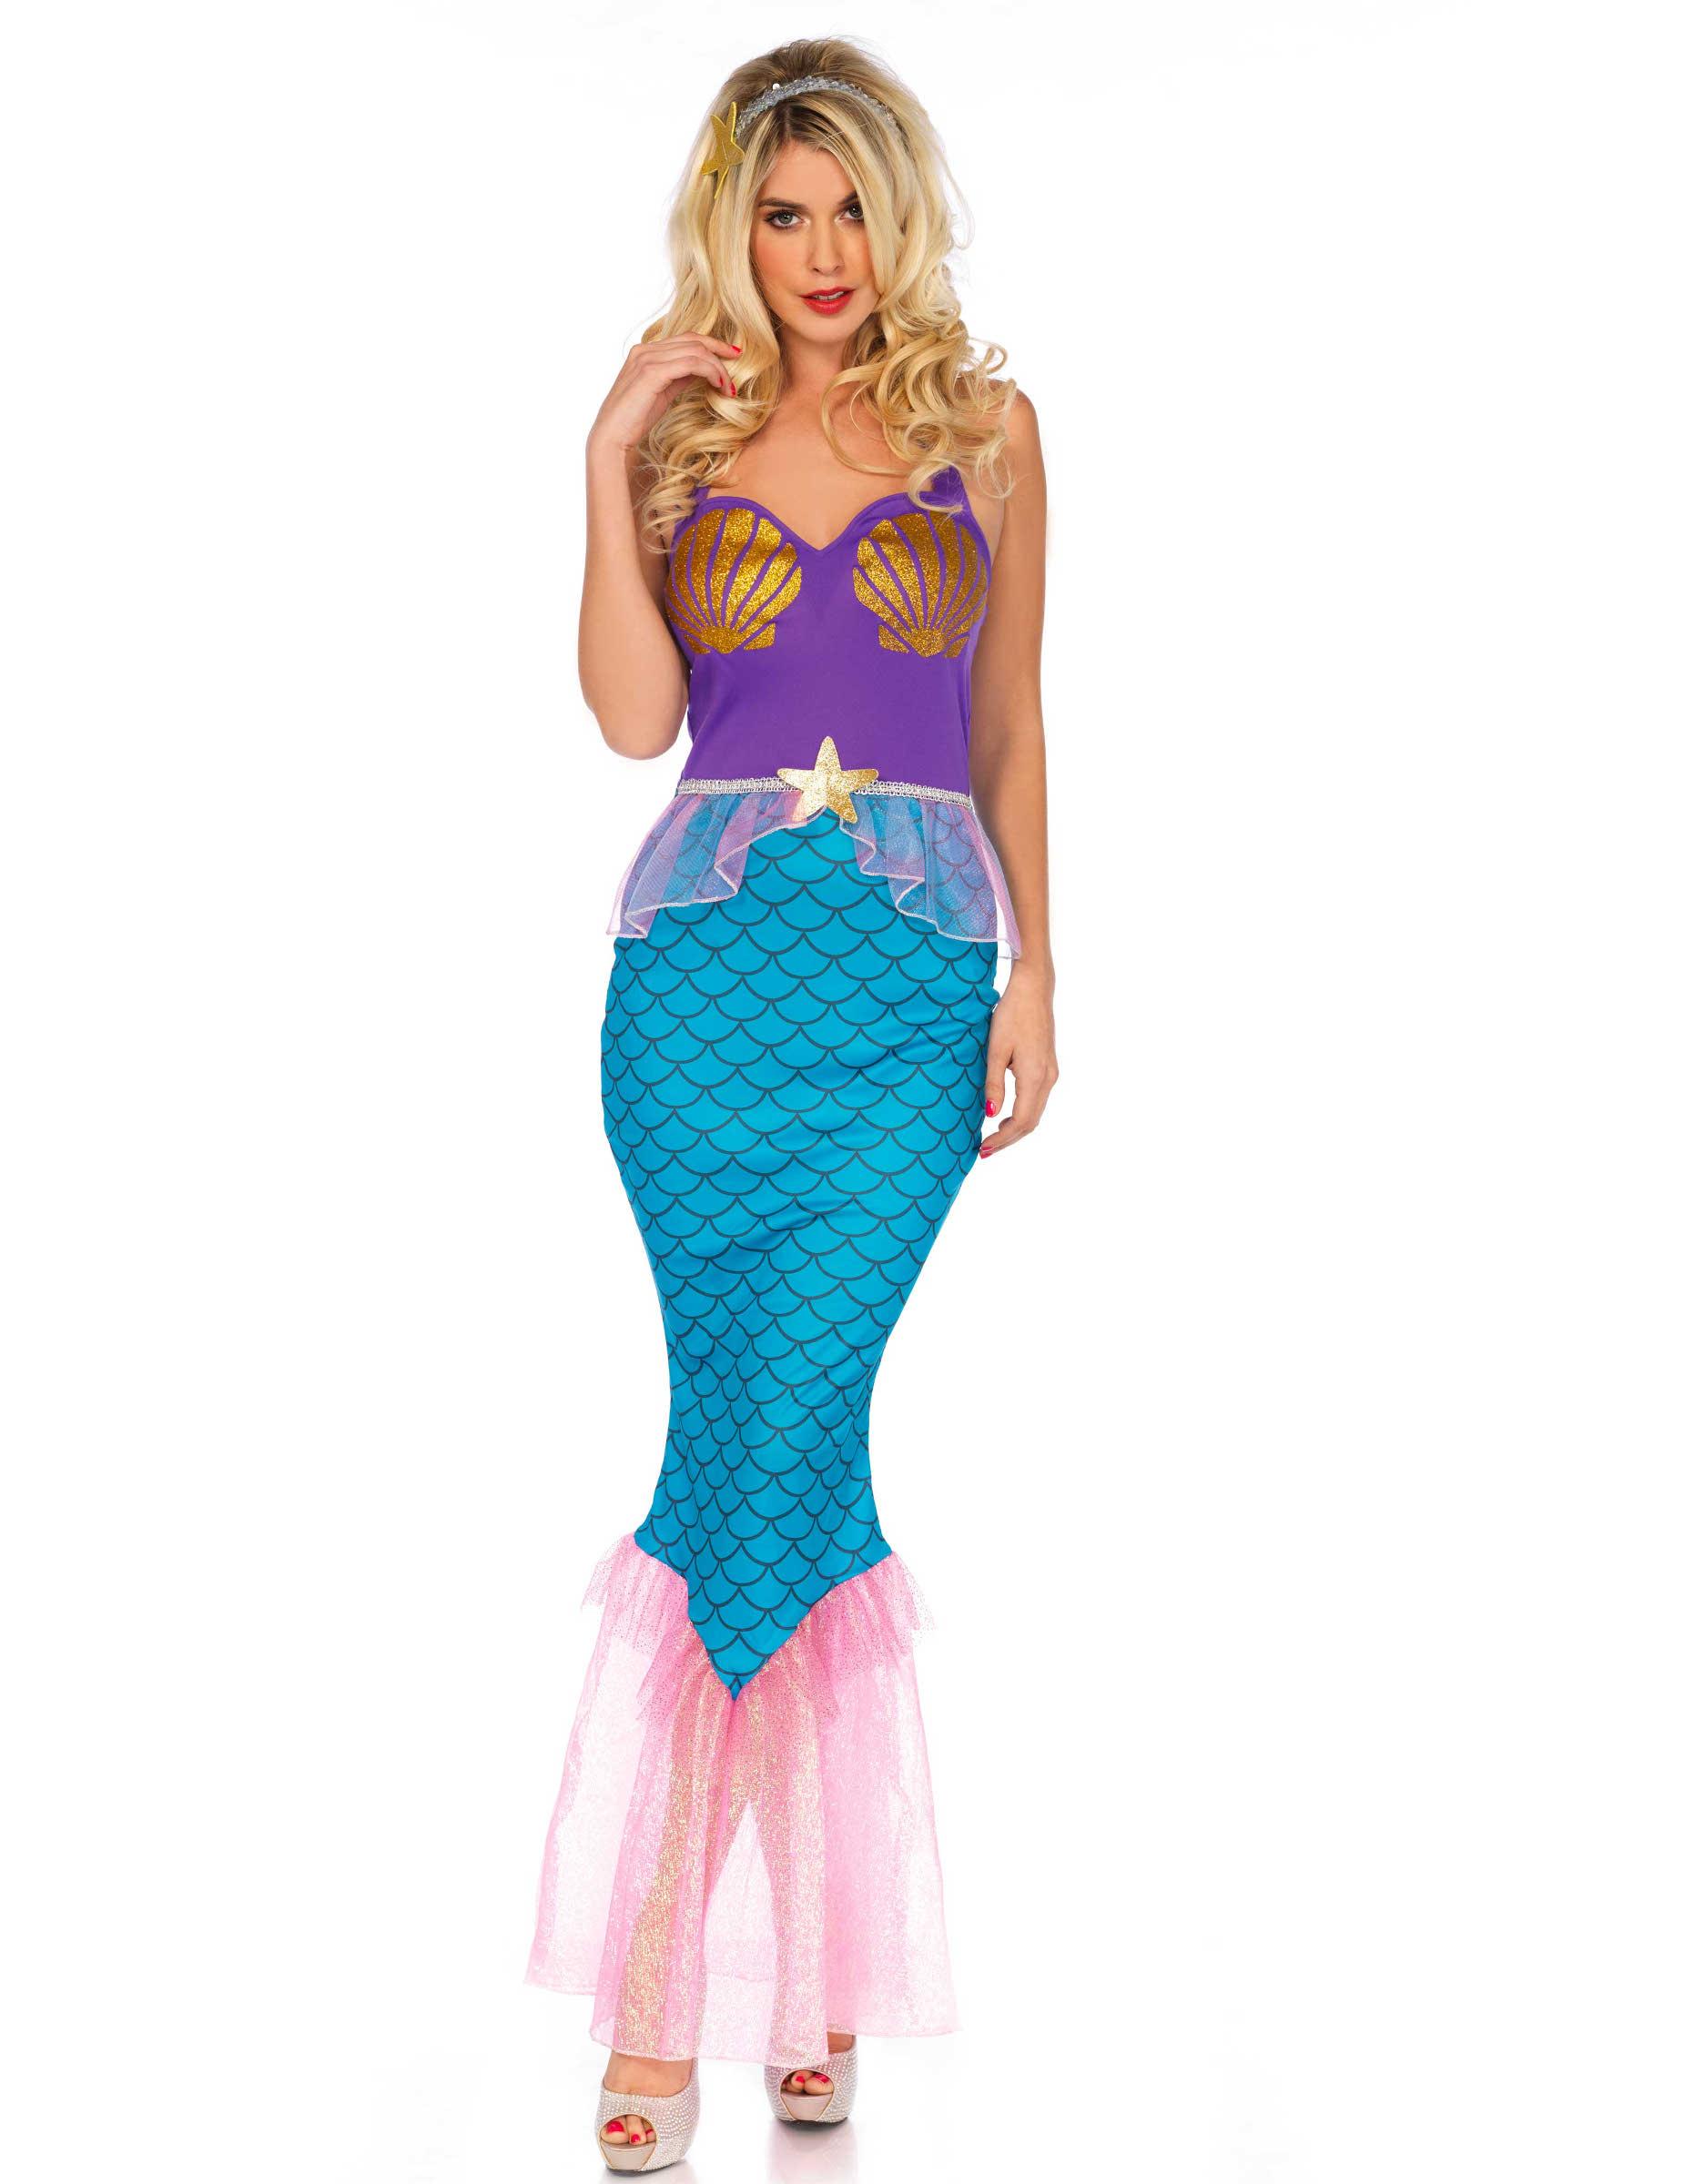 Sexy Meerjungfrauen Kostum Fur Erwachsene Kostume Fur Erwachsene